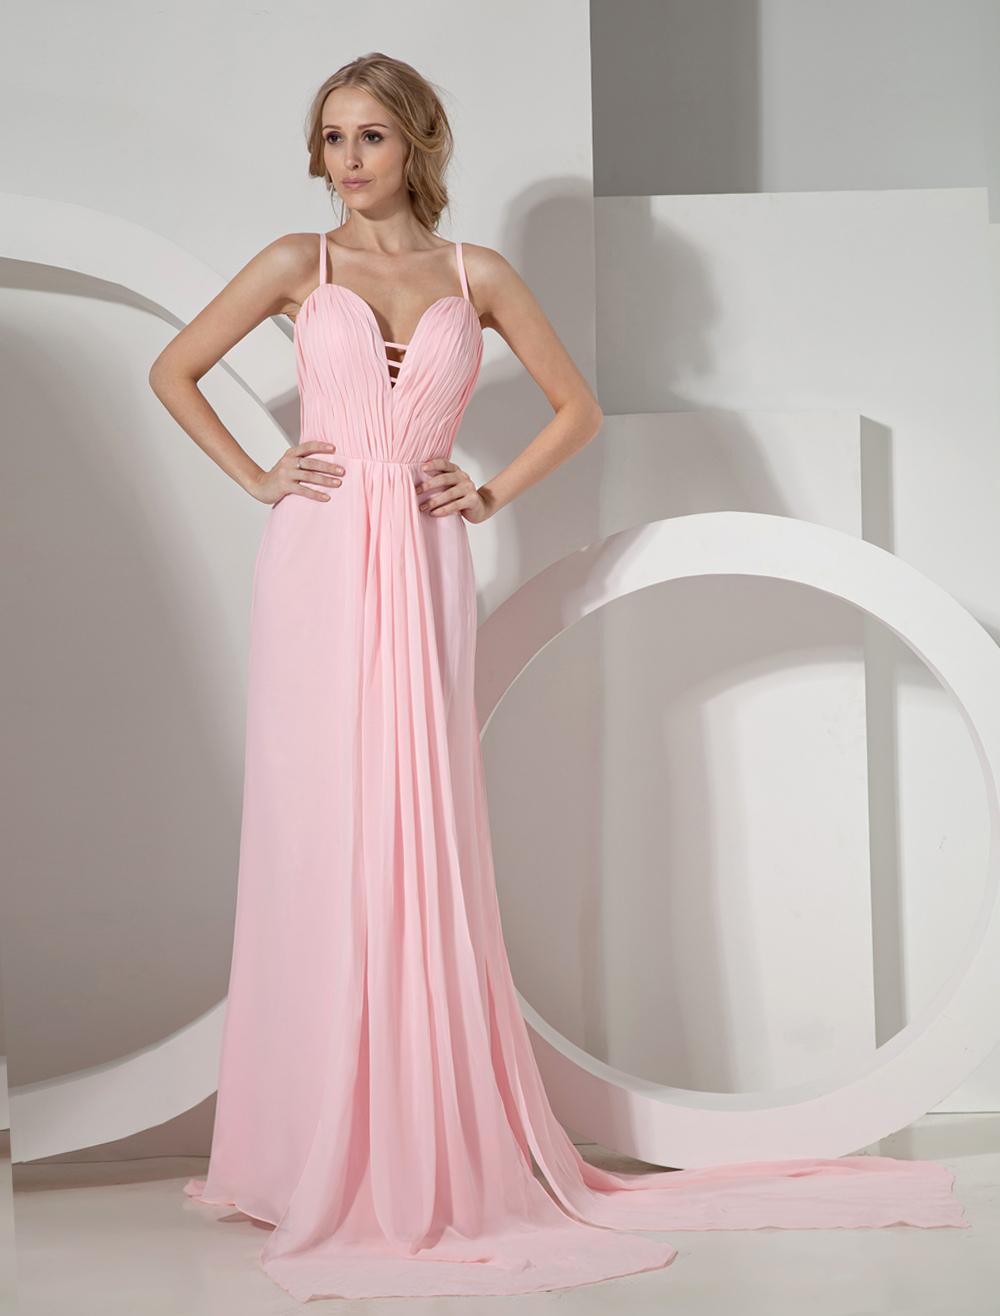 Pink Sheath Spaghetti Chiffon Woman's Evening Dress (Wedding Evening Dresses) photo